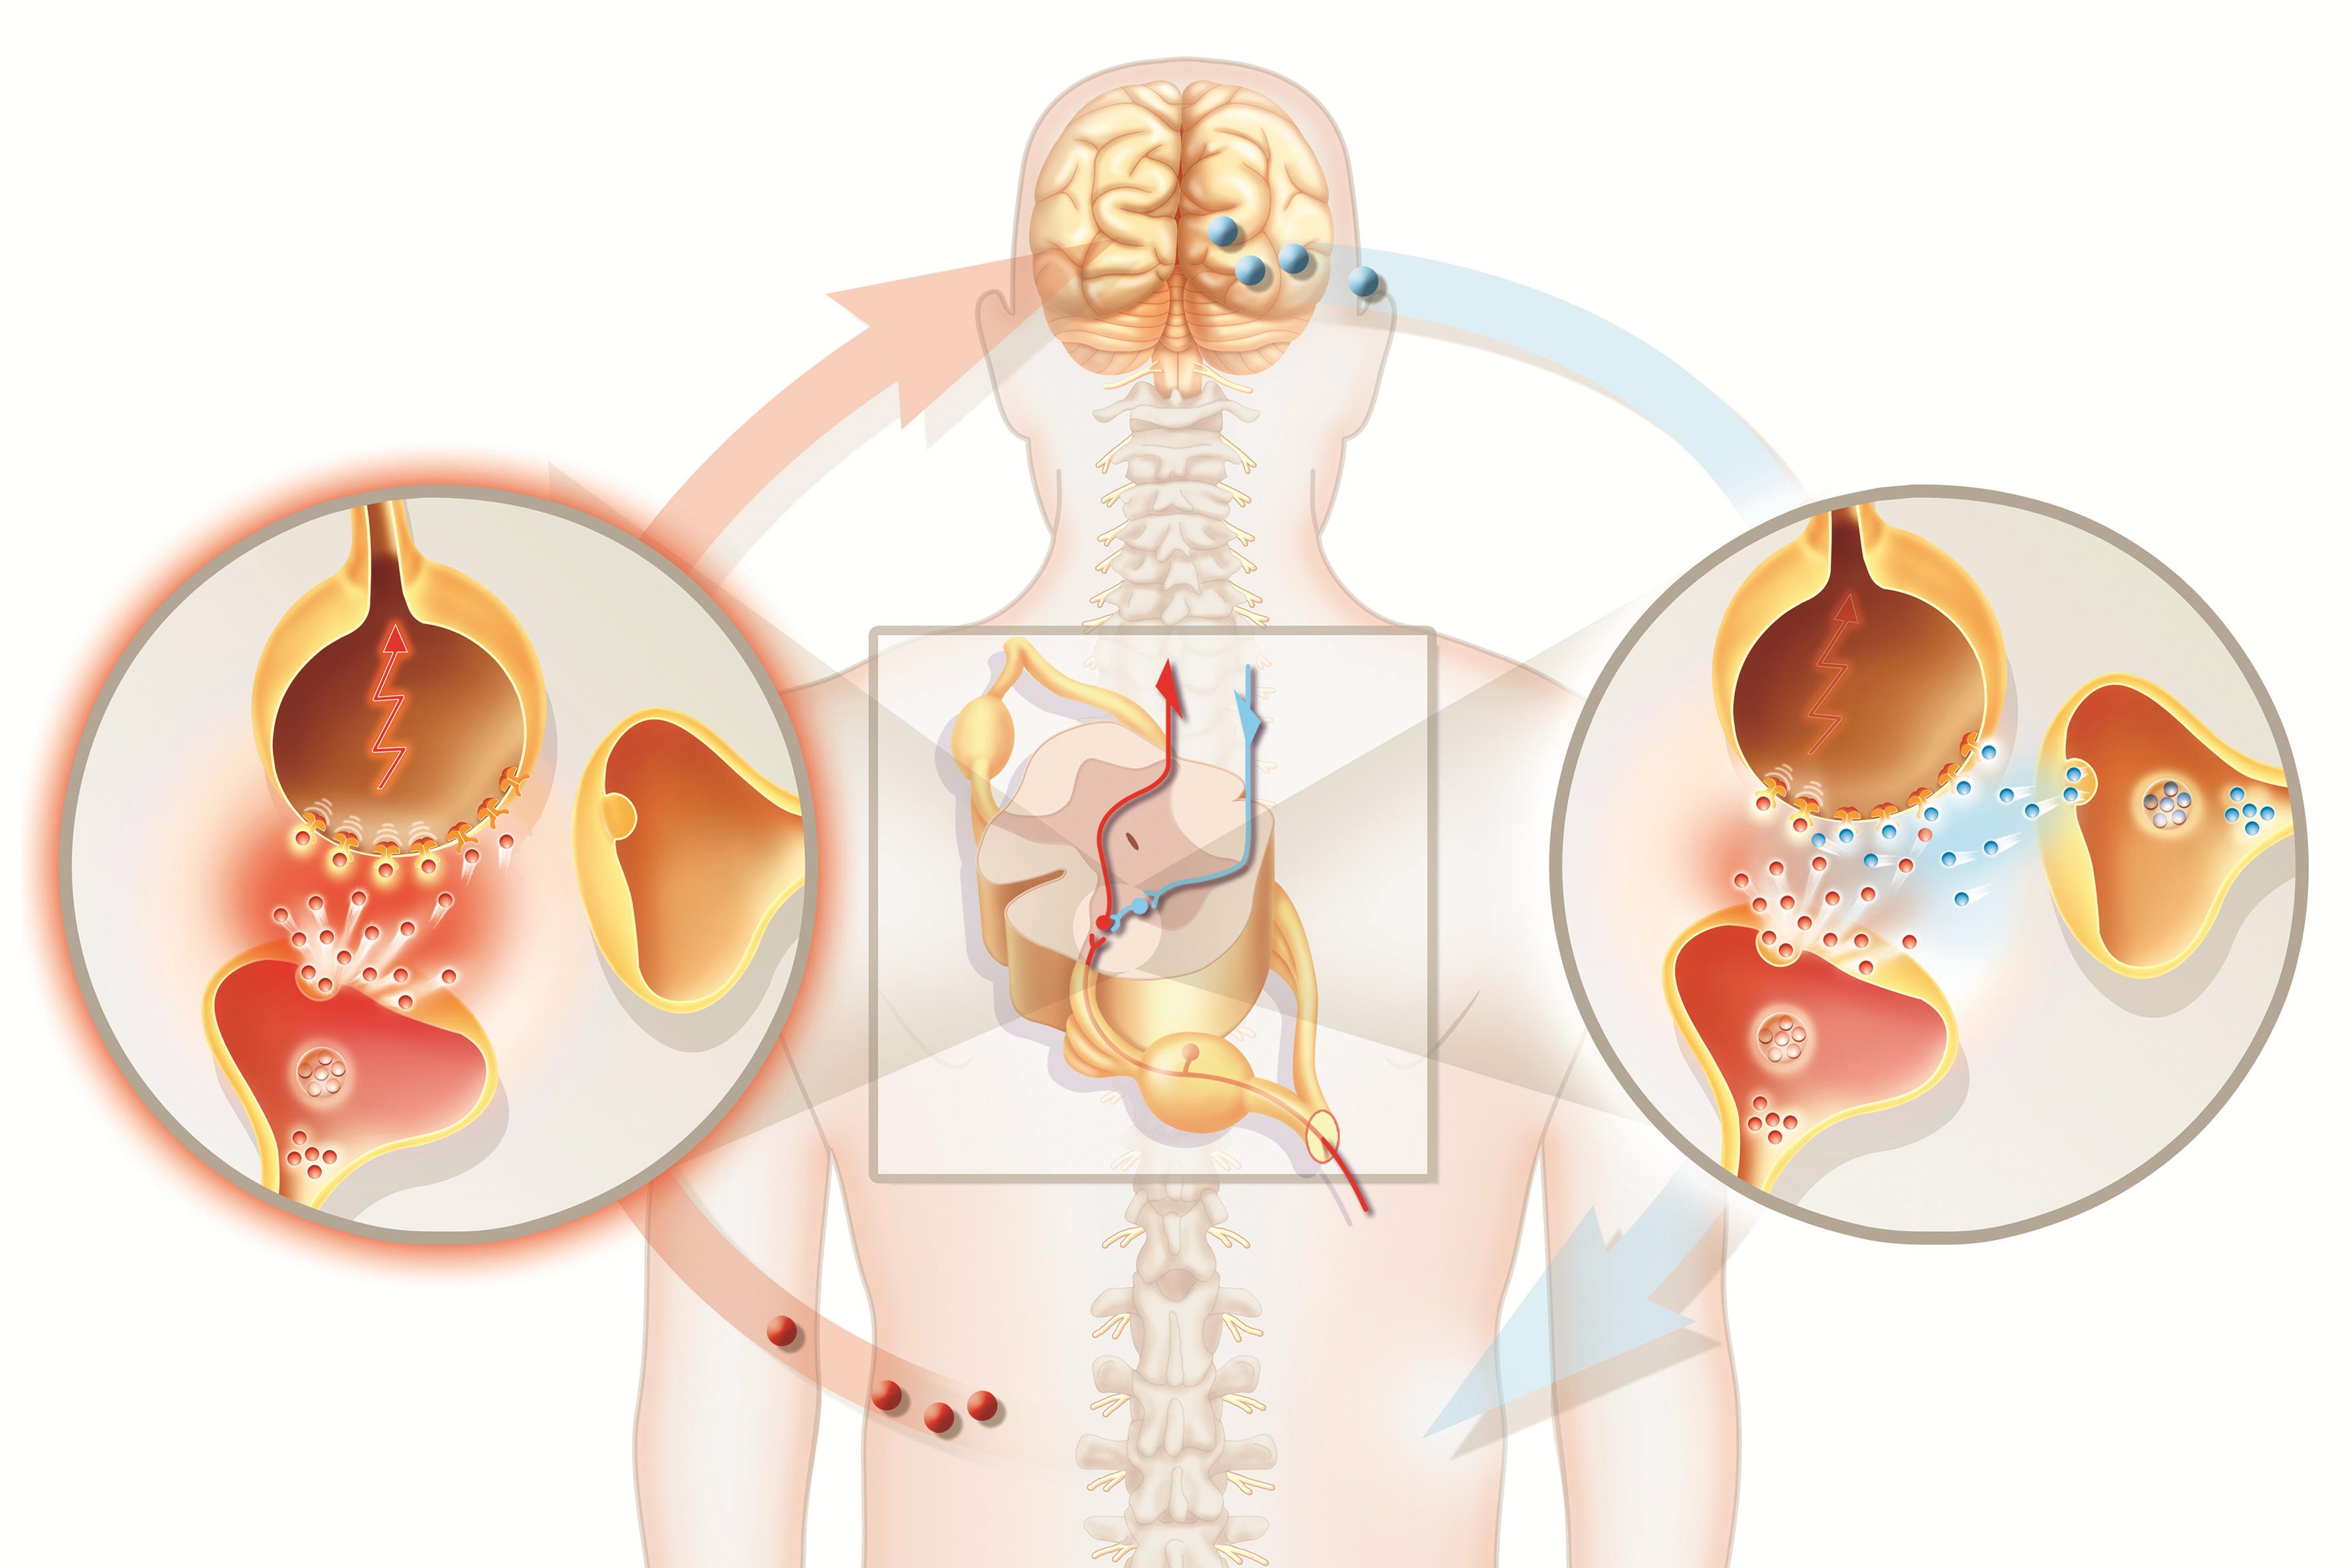 Gabapin benefit in Neuropathic